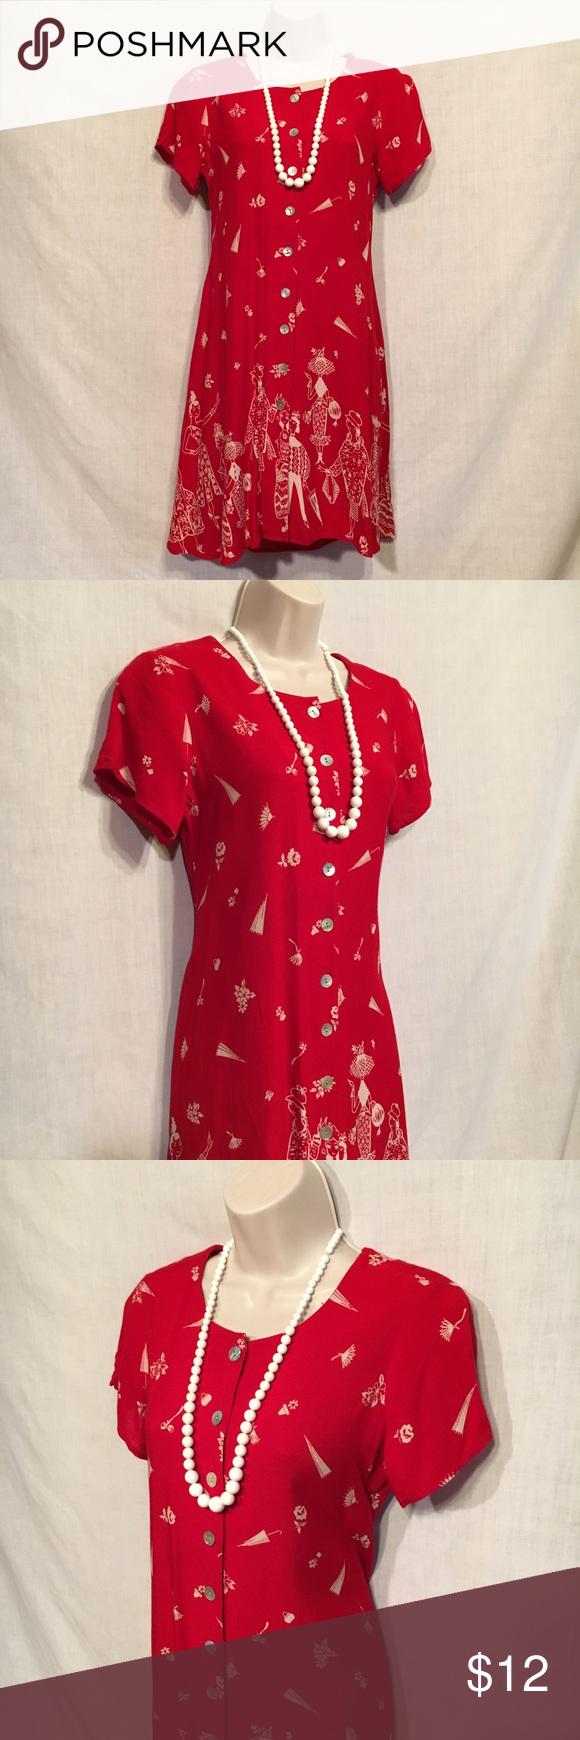 Coldwater creek red dress unique design scoop neck short sleeve